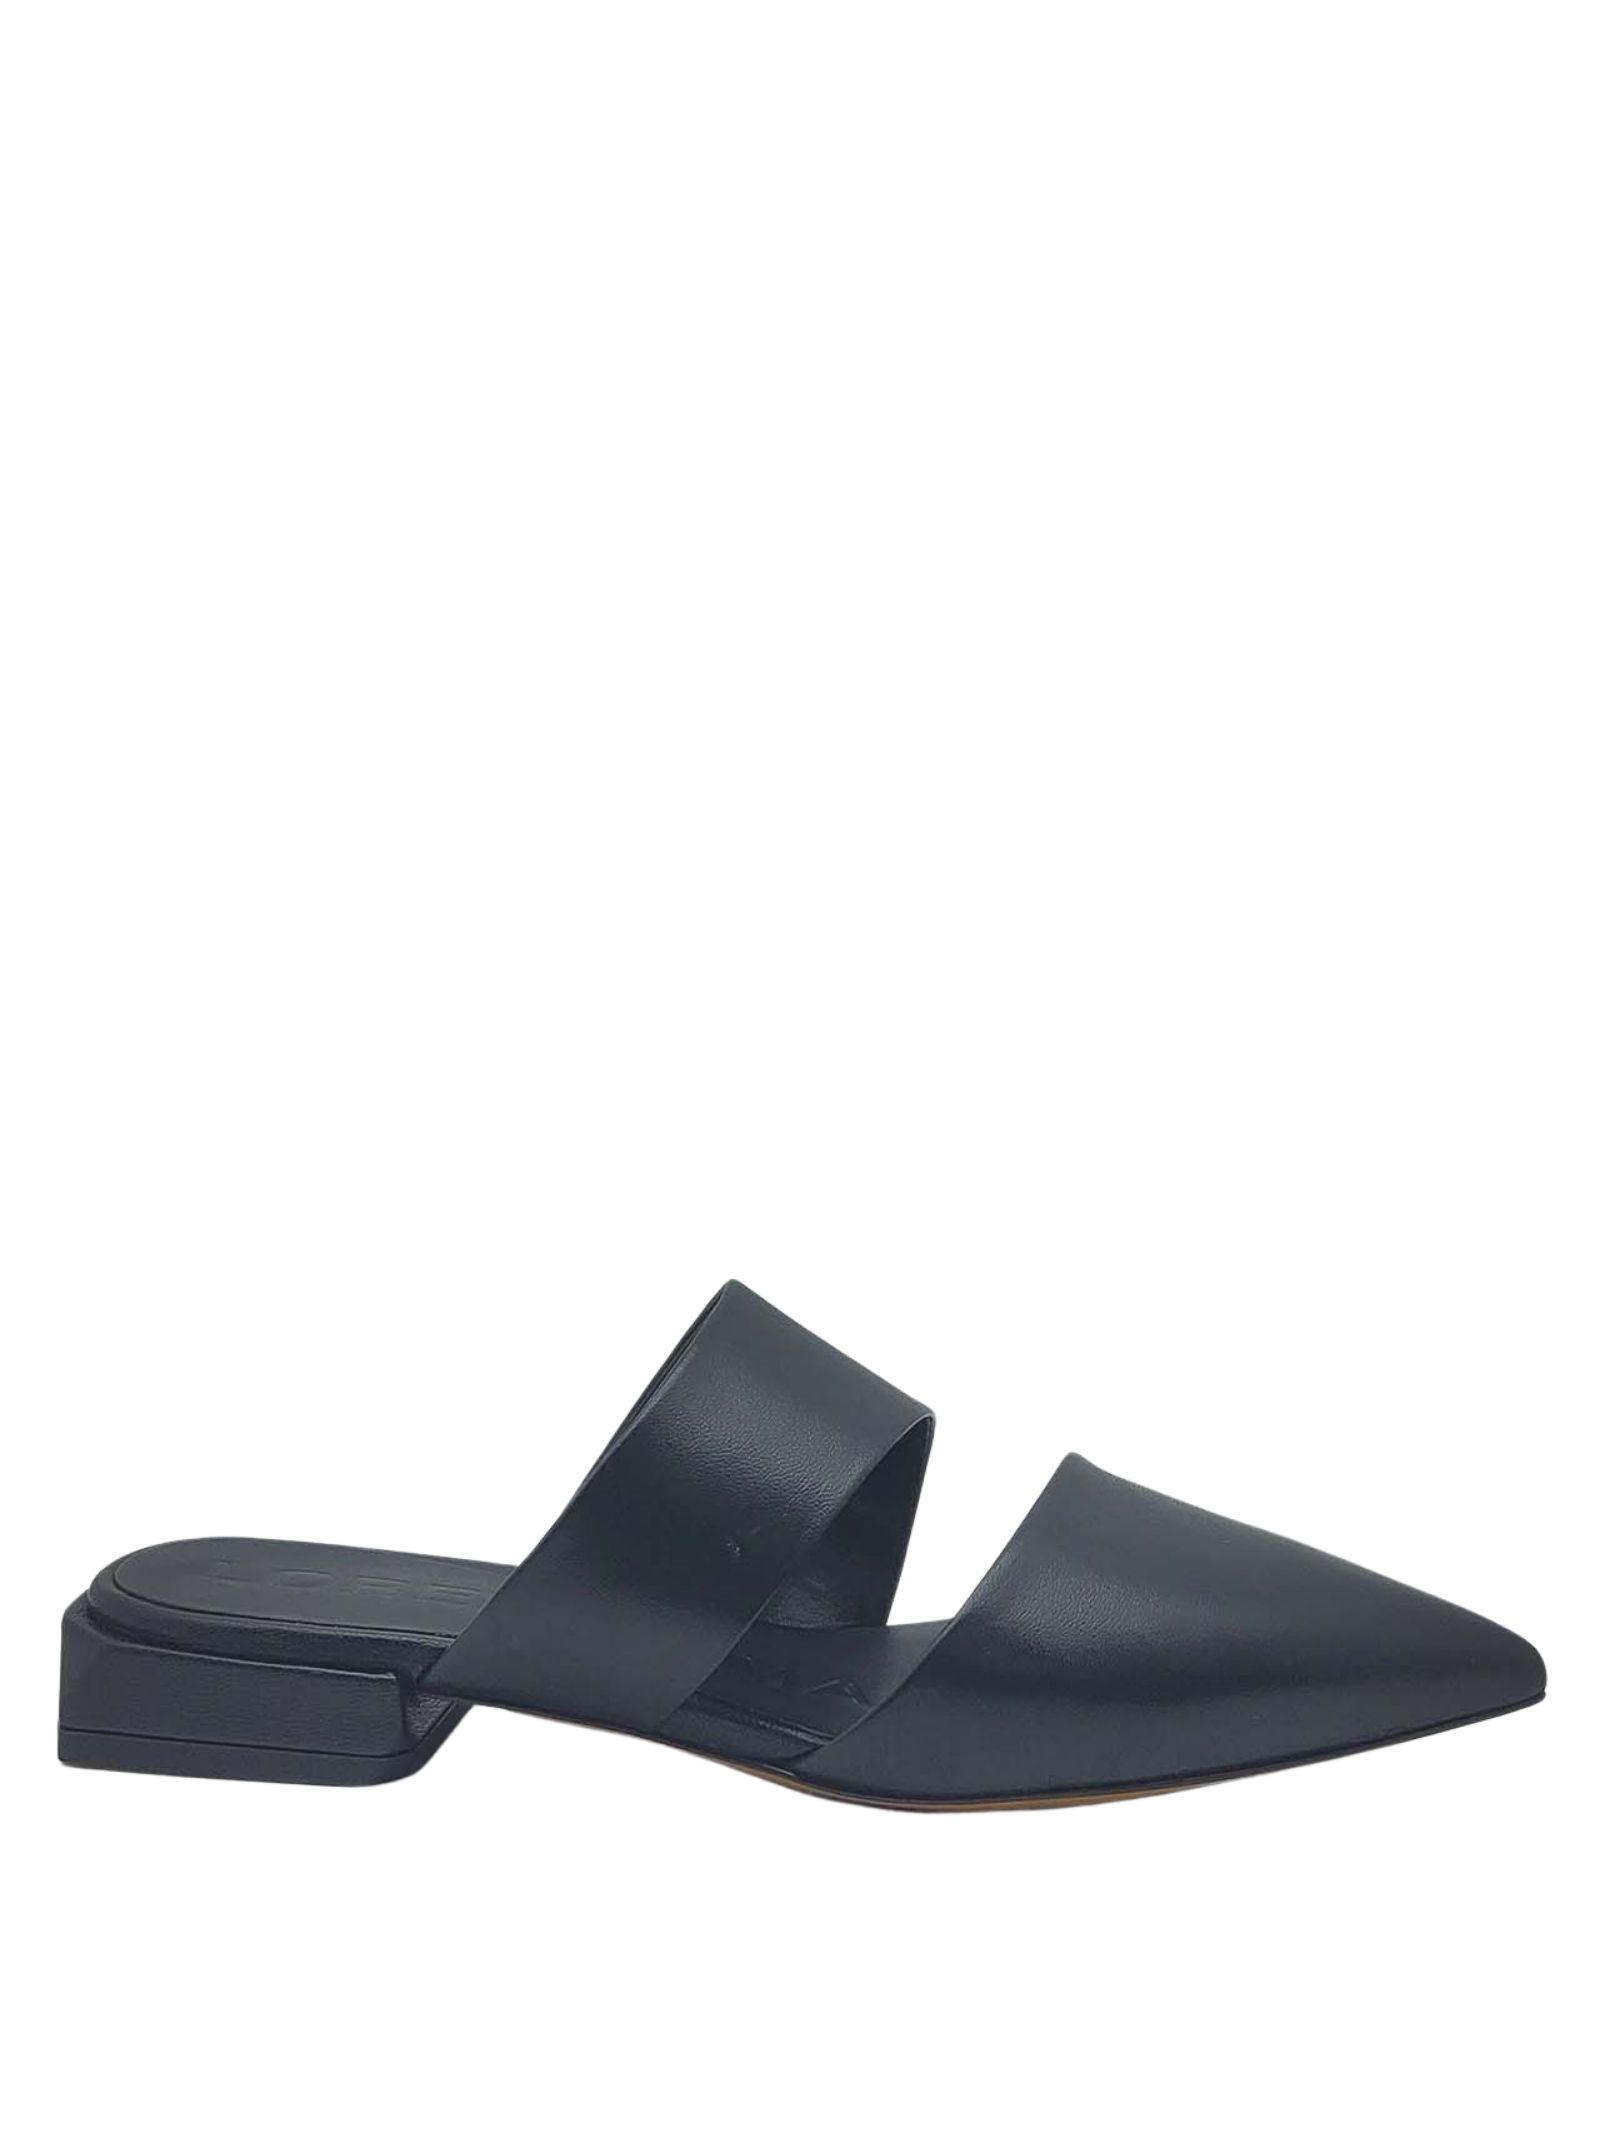 Women's Shoes Black Leather Mule Sandals with Double Band Lorenzo Mari | Sandals | PURITANI001